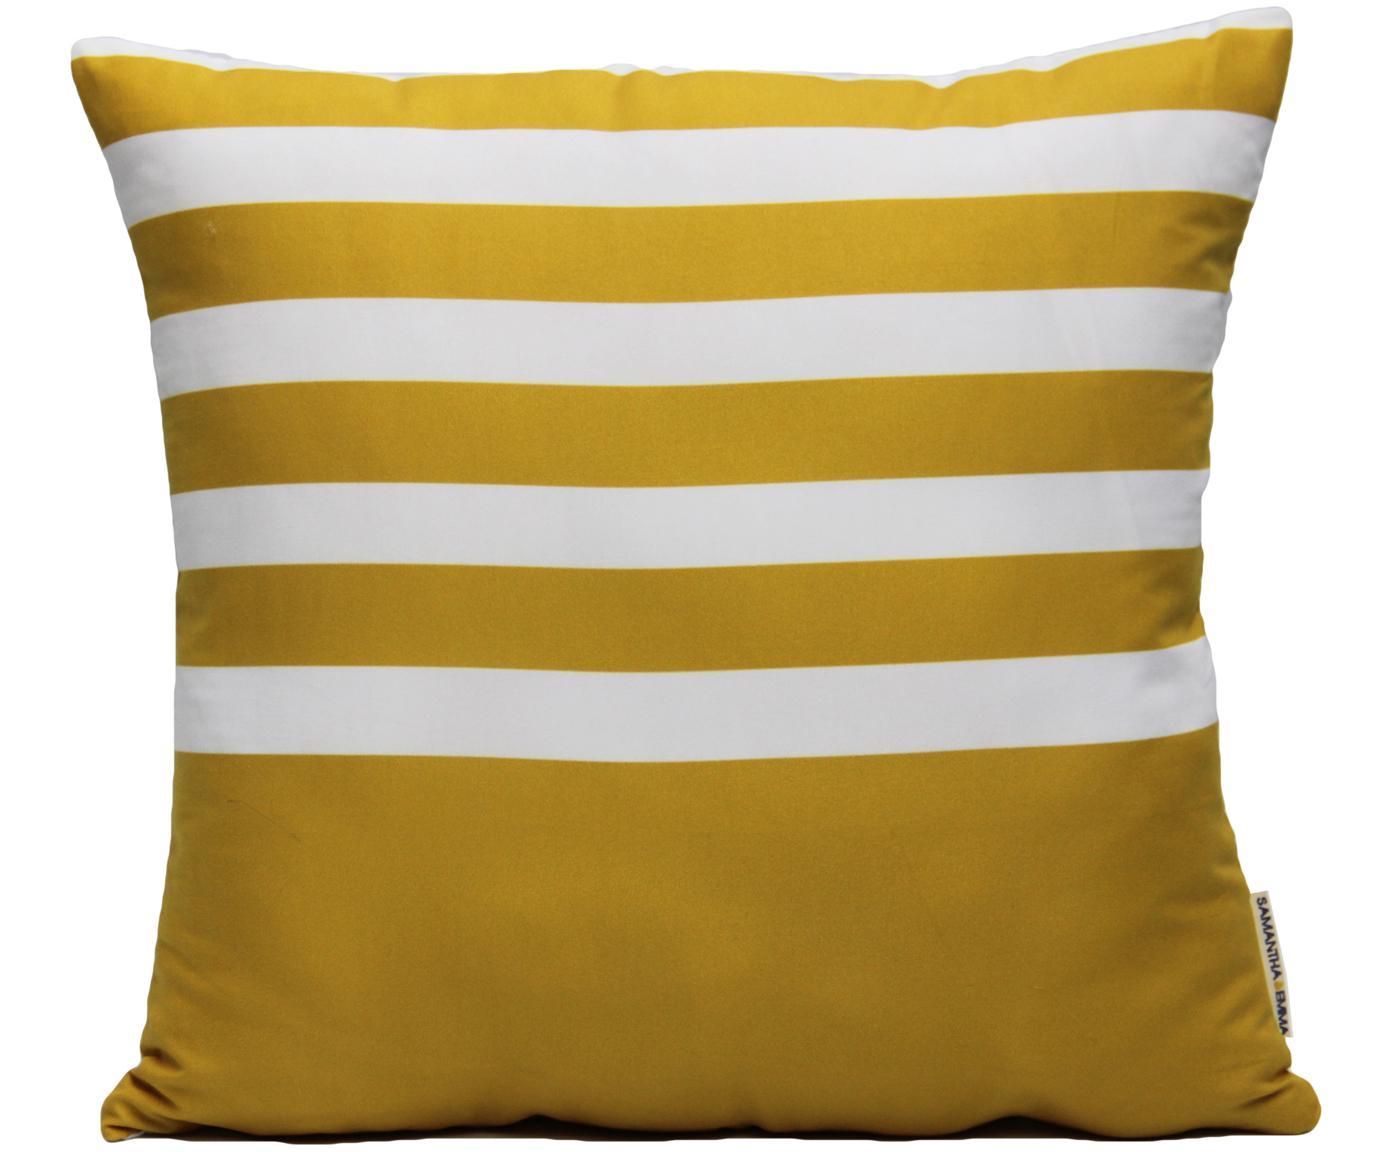 Funda de cojín Ela, Poliéster, Blanco, amarillo, An 40 x L 40 cm